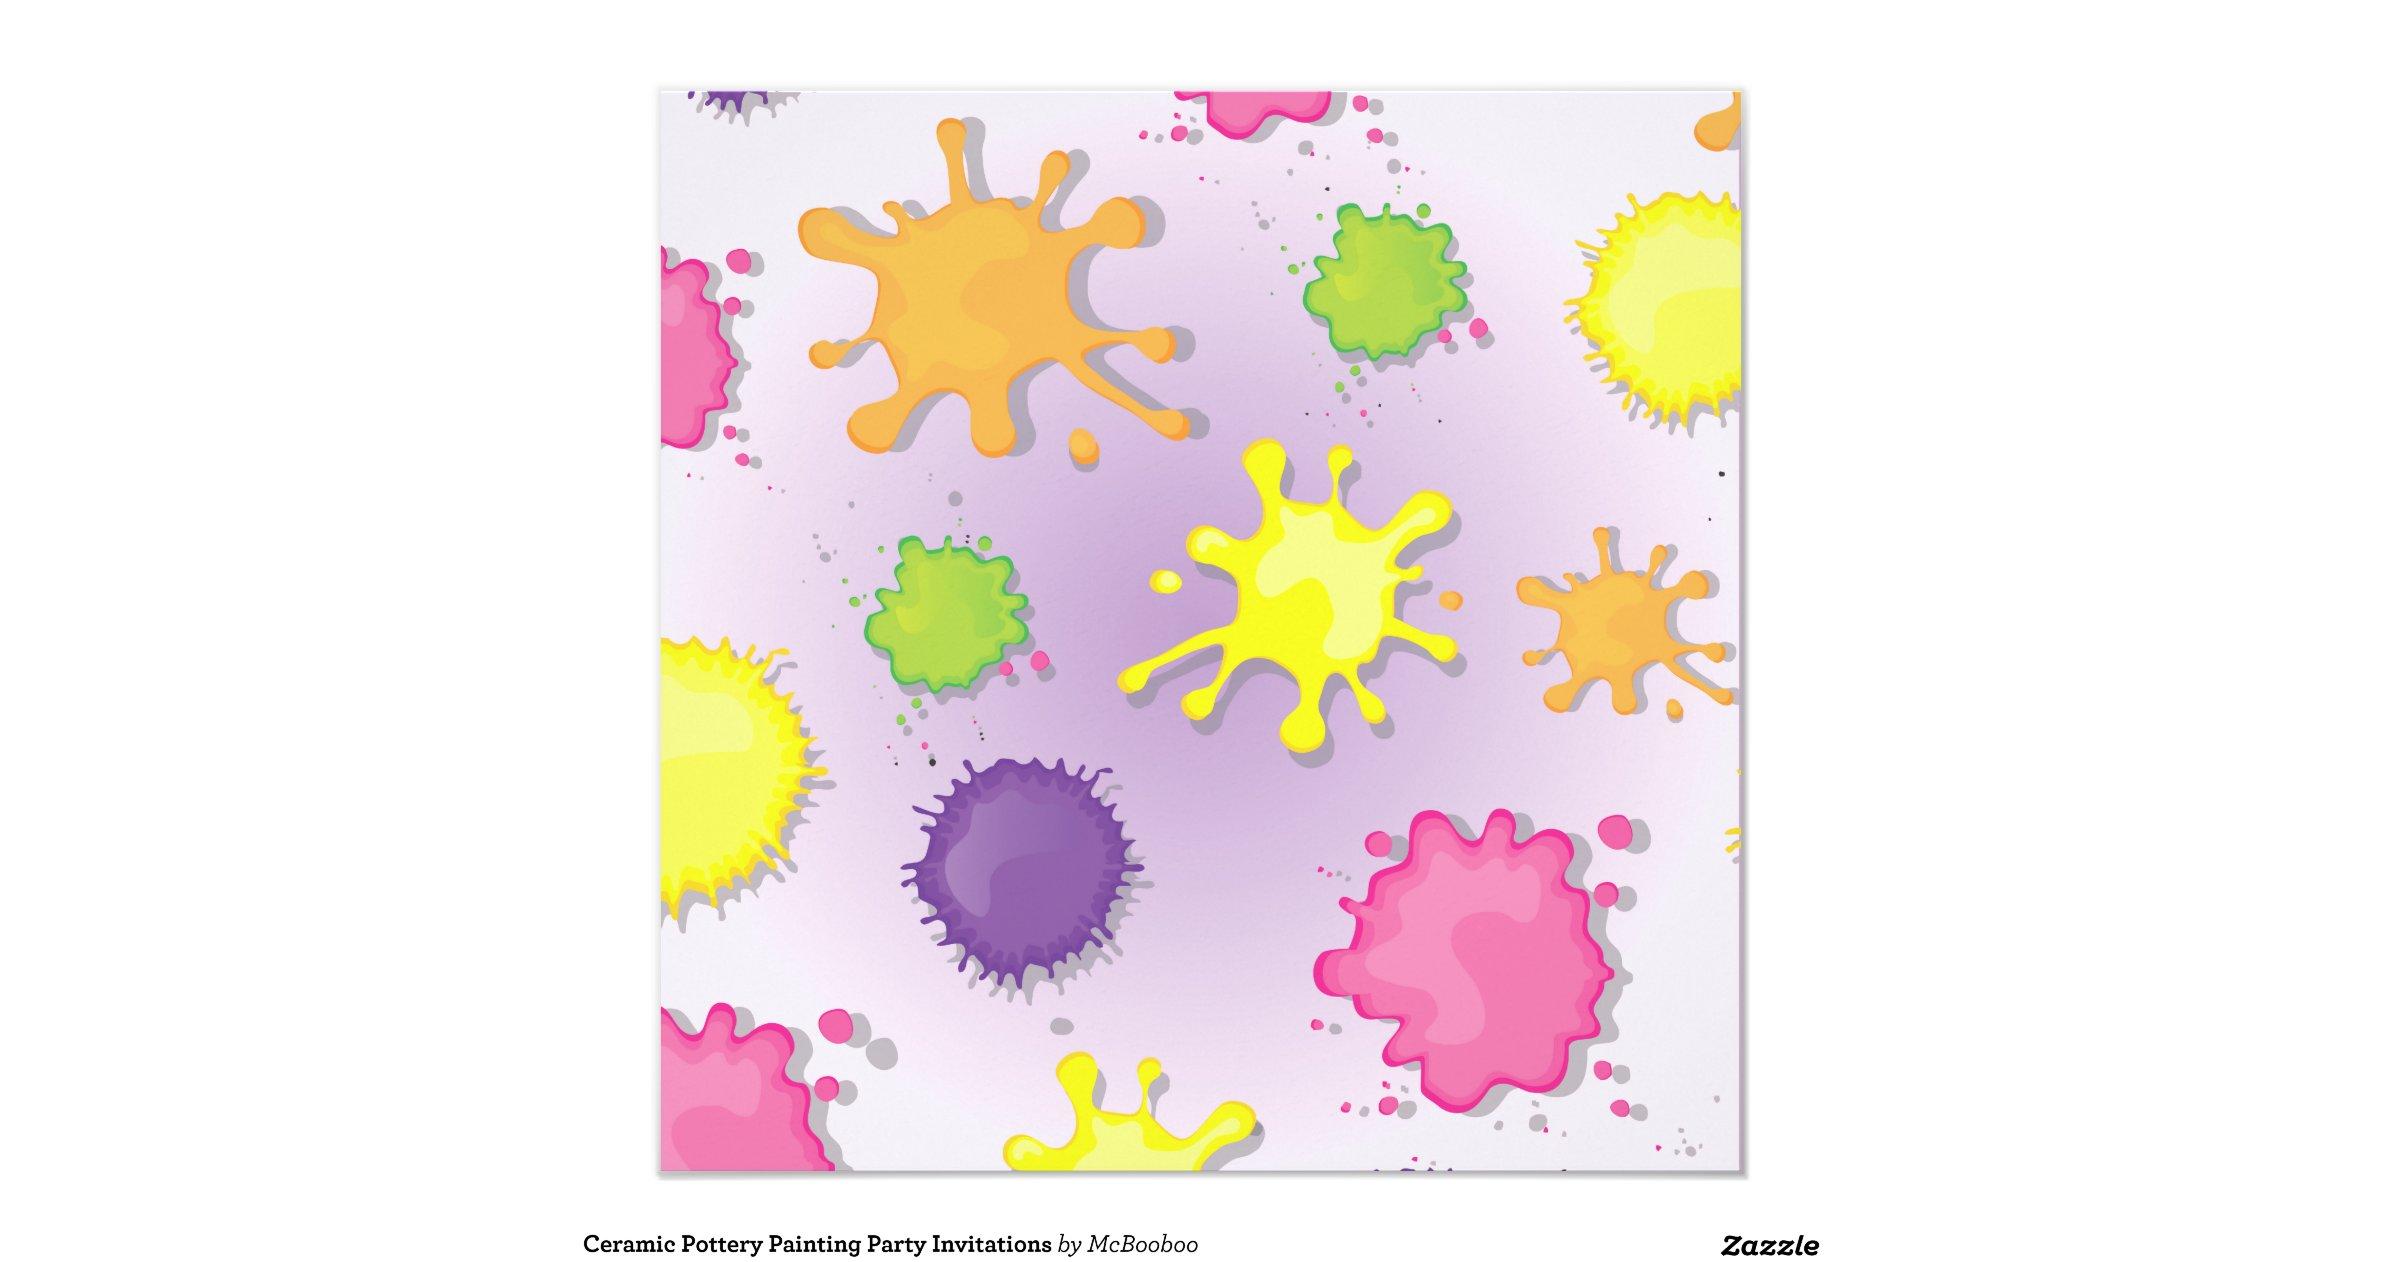 ceramic painting invitations - 28 images - ceramic pottery painting ...